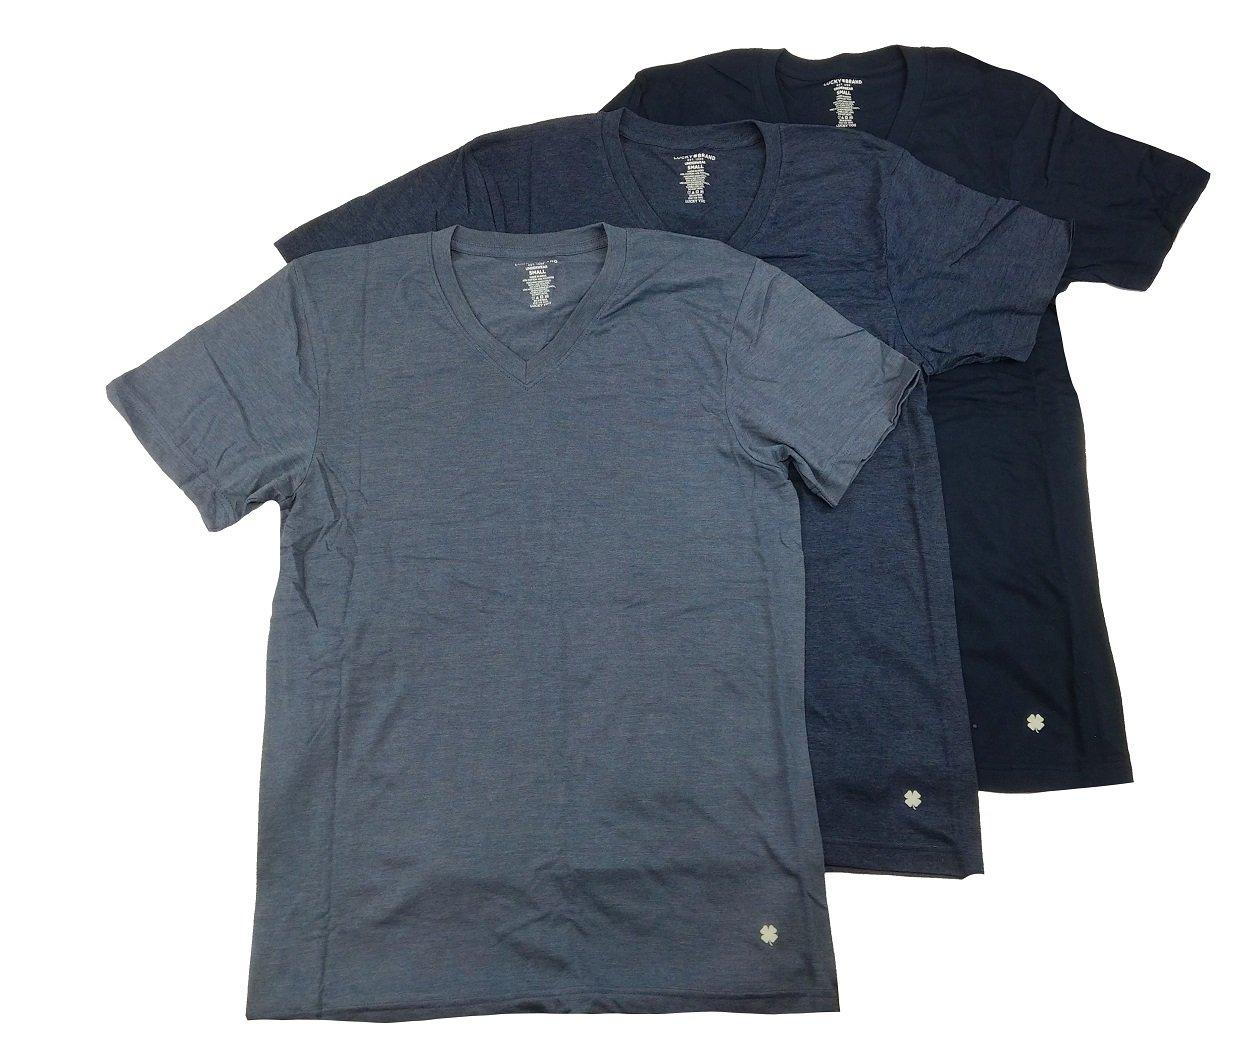 Lucky Brand Men's V-Neck T-Shirts Pack of 3 (Navy/Navy Blue/Blue, X-Large)